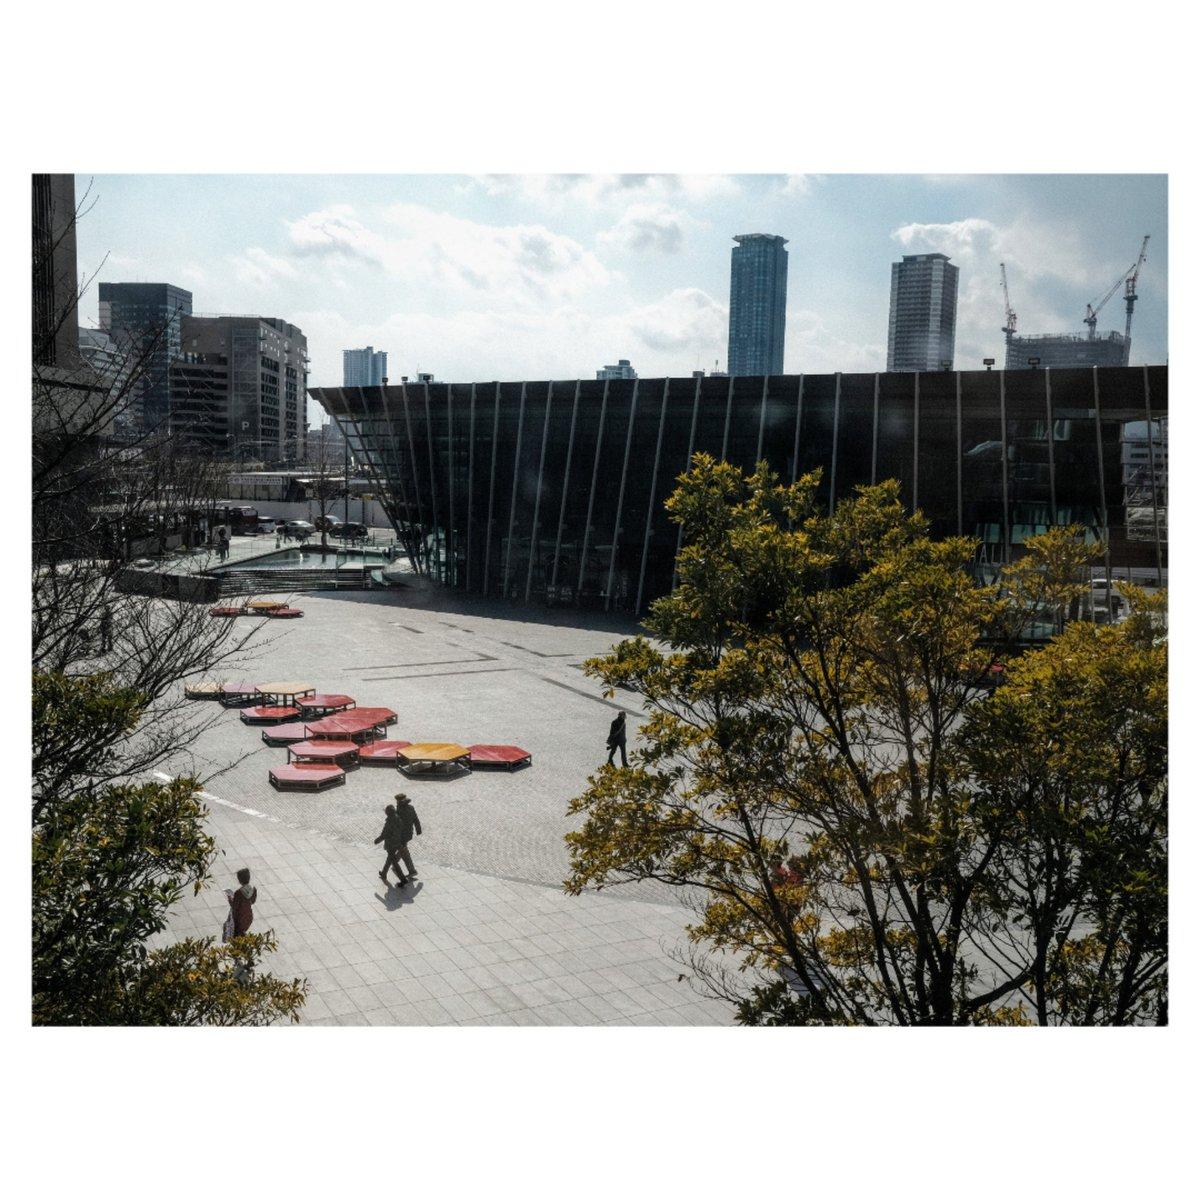 March 2020 #fujifilm #xe3 #Japan #photography #streetphotography #streetphoto #streetsnap #coregraphy #Osakapic.twitter.com/P2shswlKqe